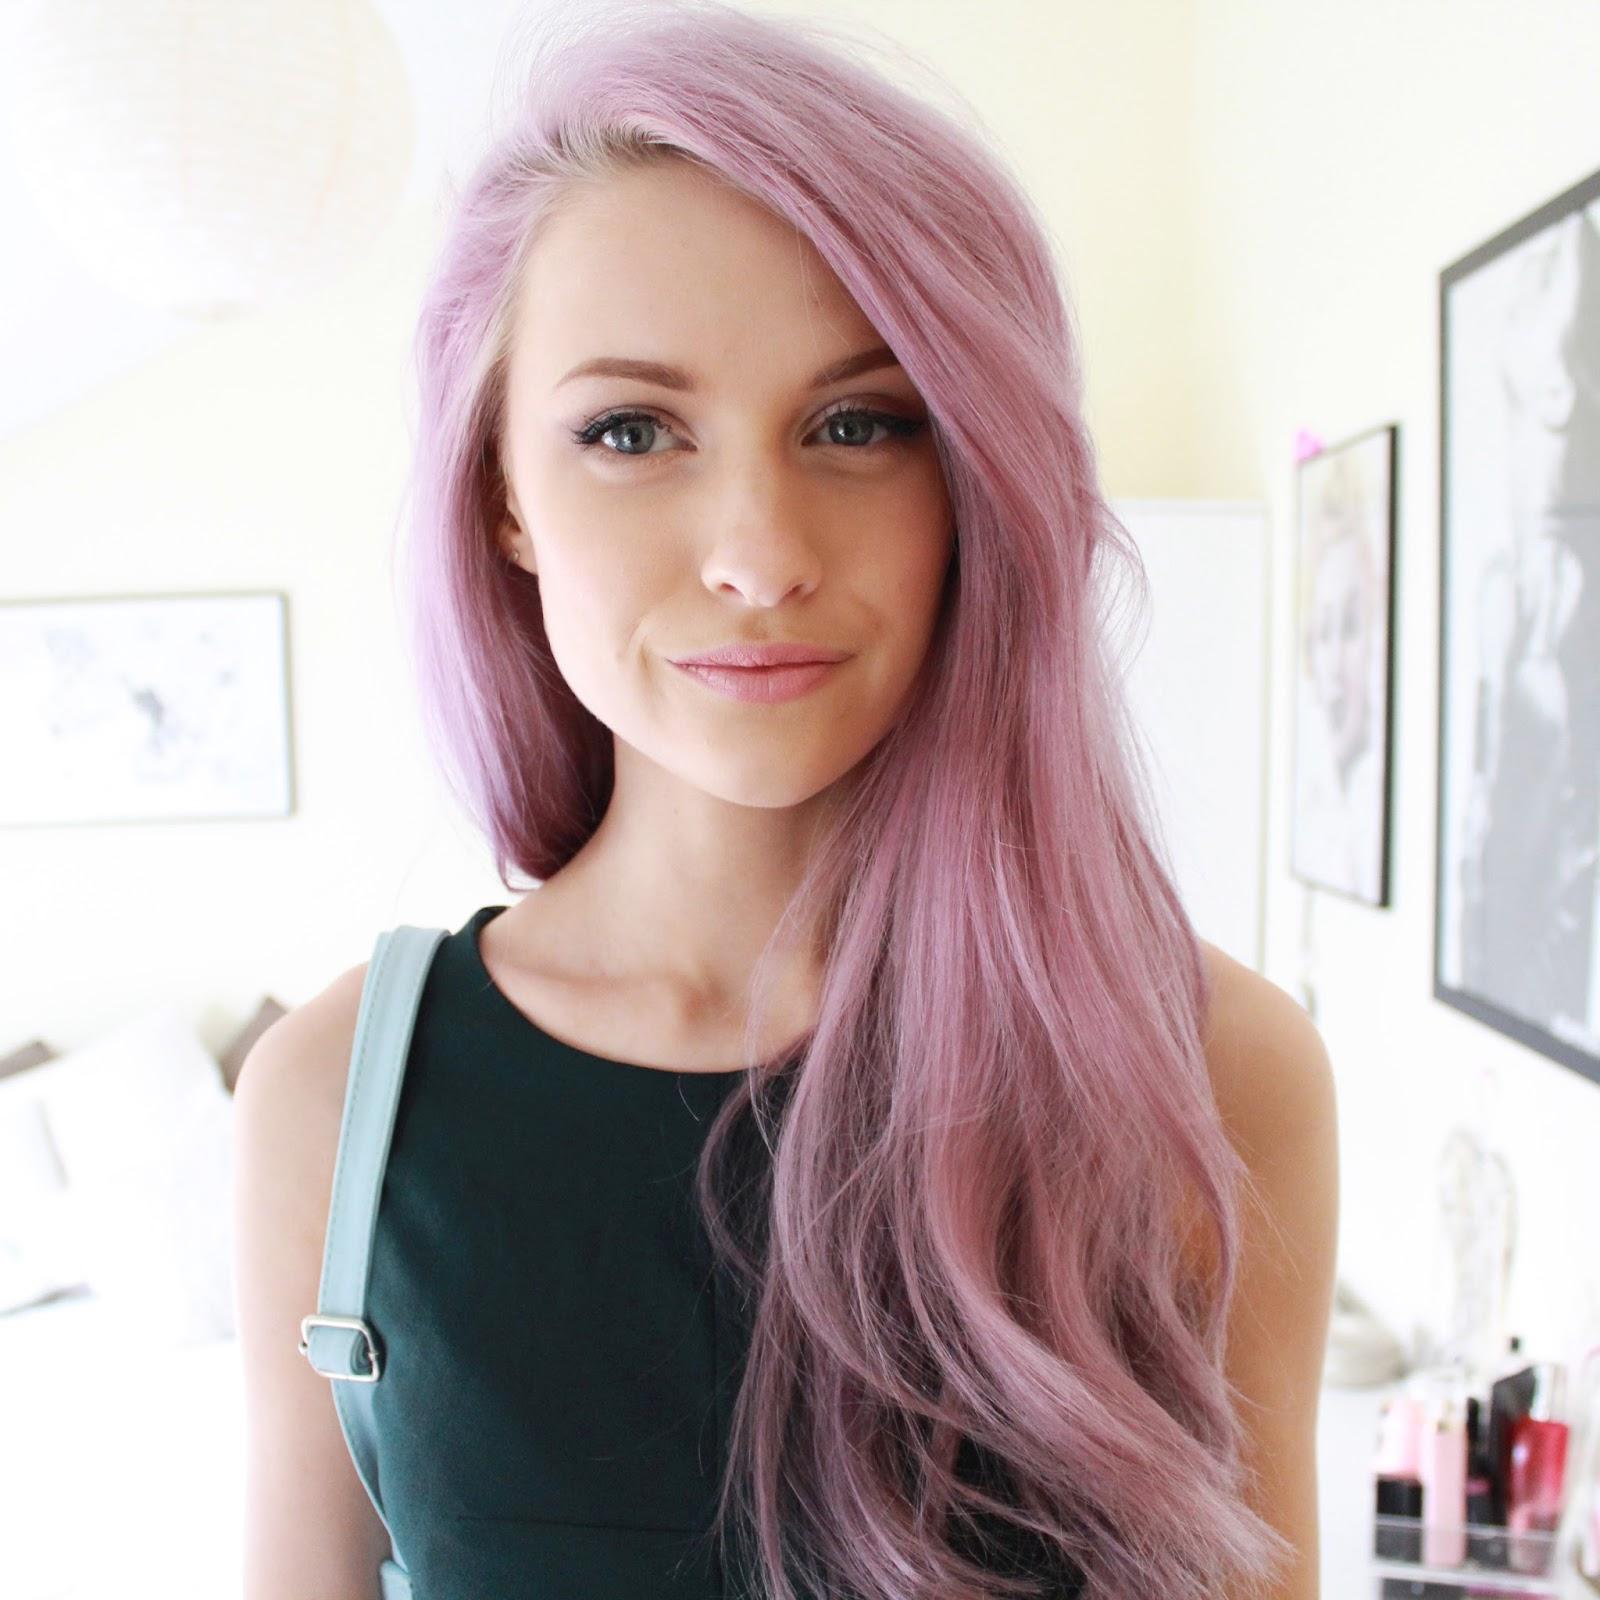 Girls With Light Purple Hair Tumblr Verge Girl Scandal Playsuit